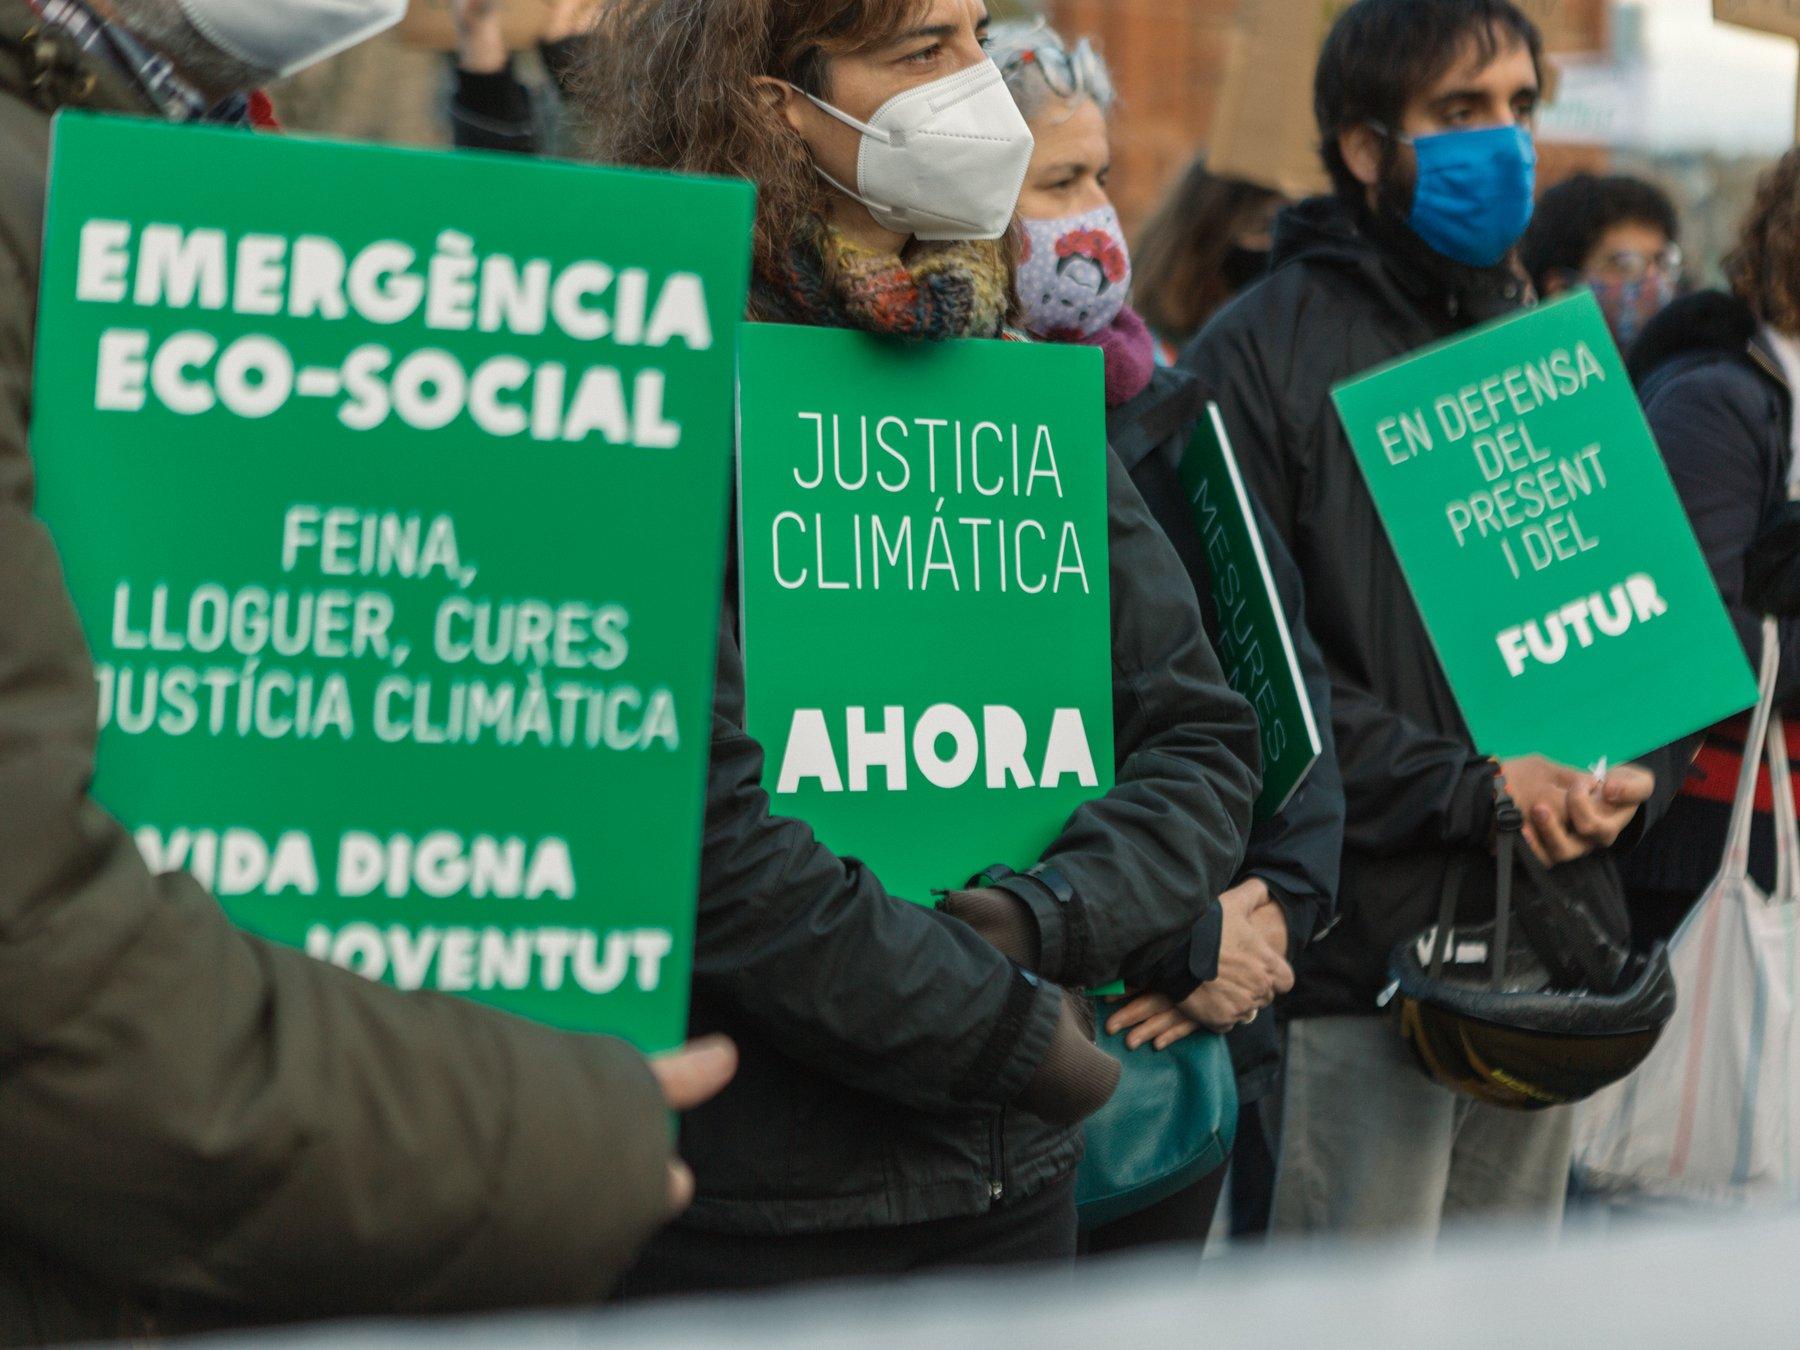 21-03-19 (Acción Global Justícia Climática Oxfam)-36